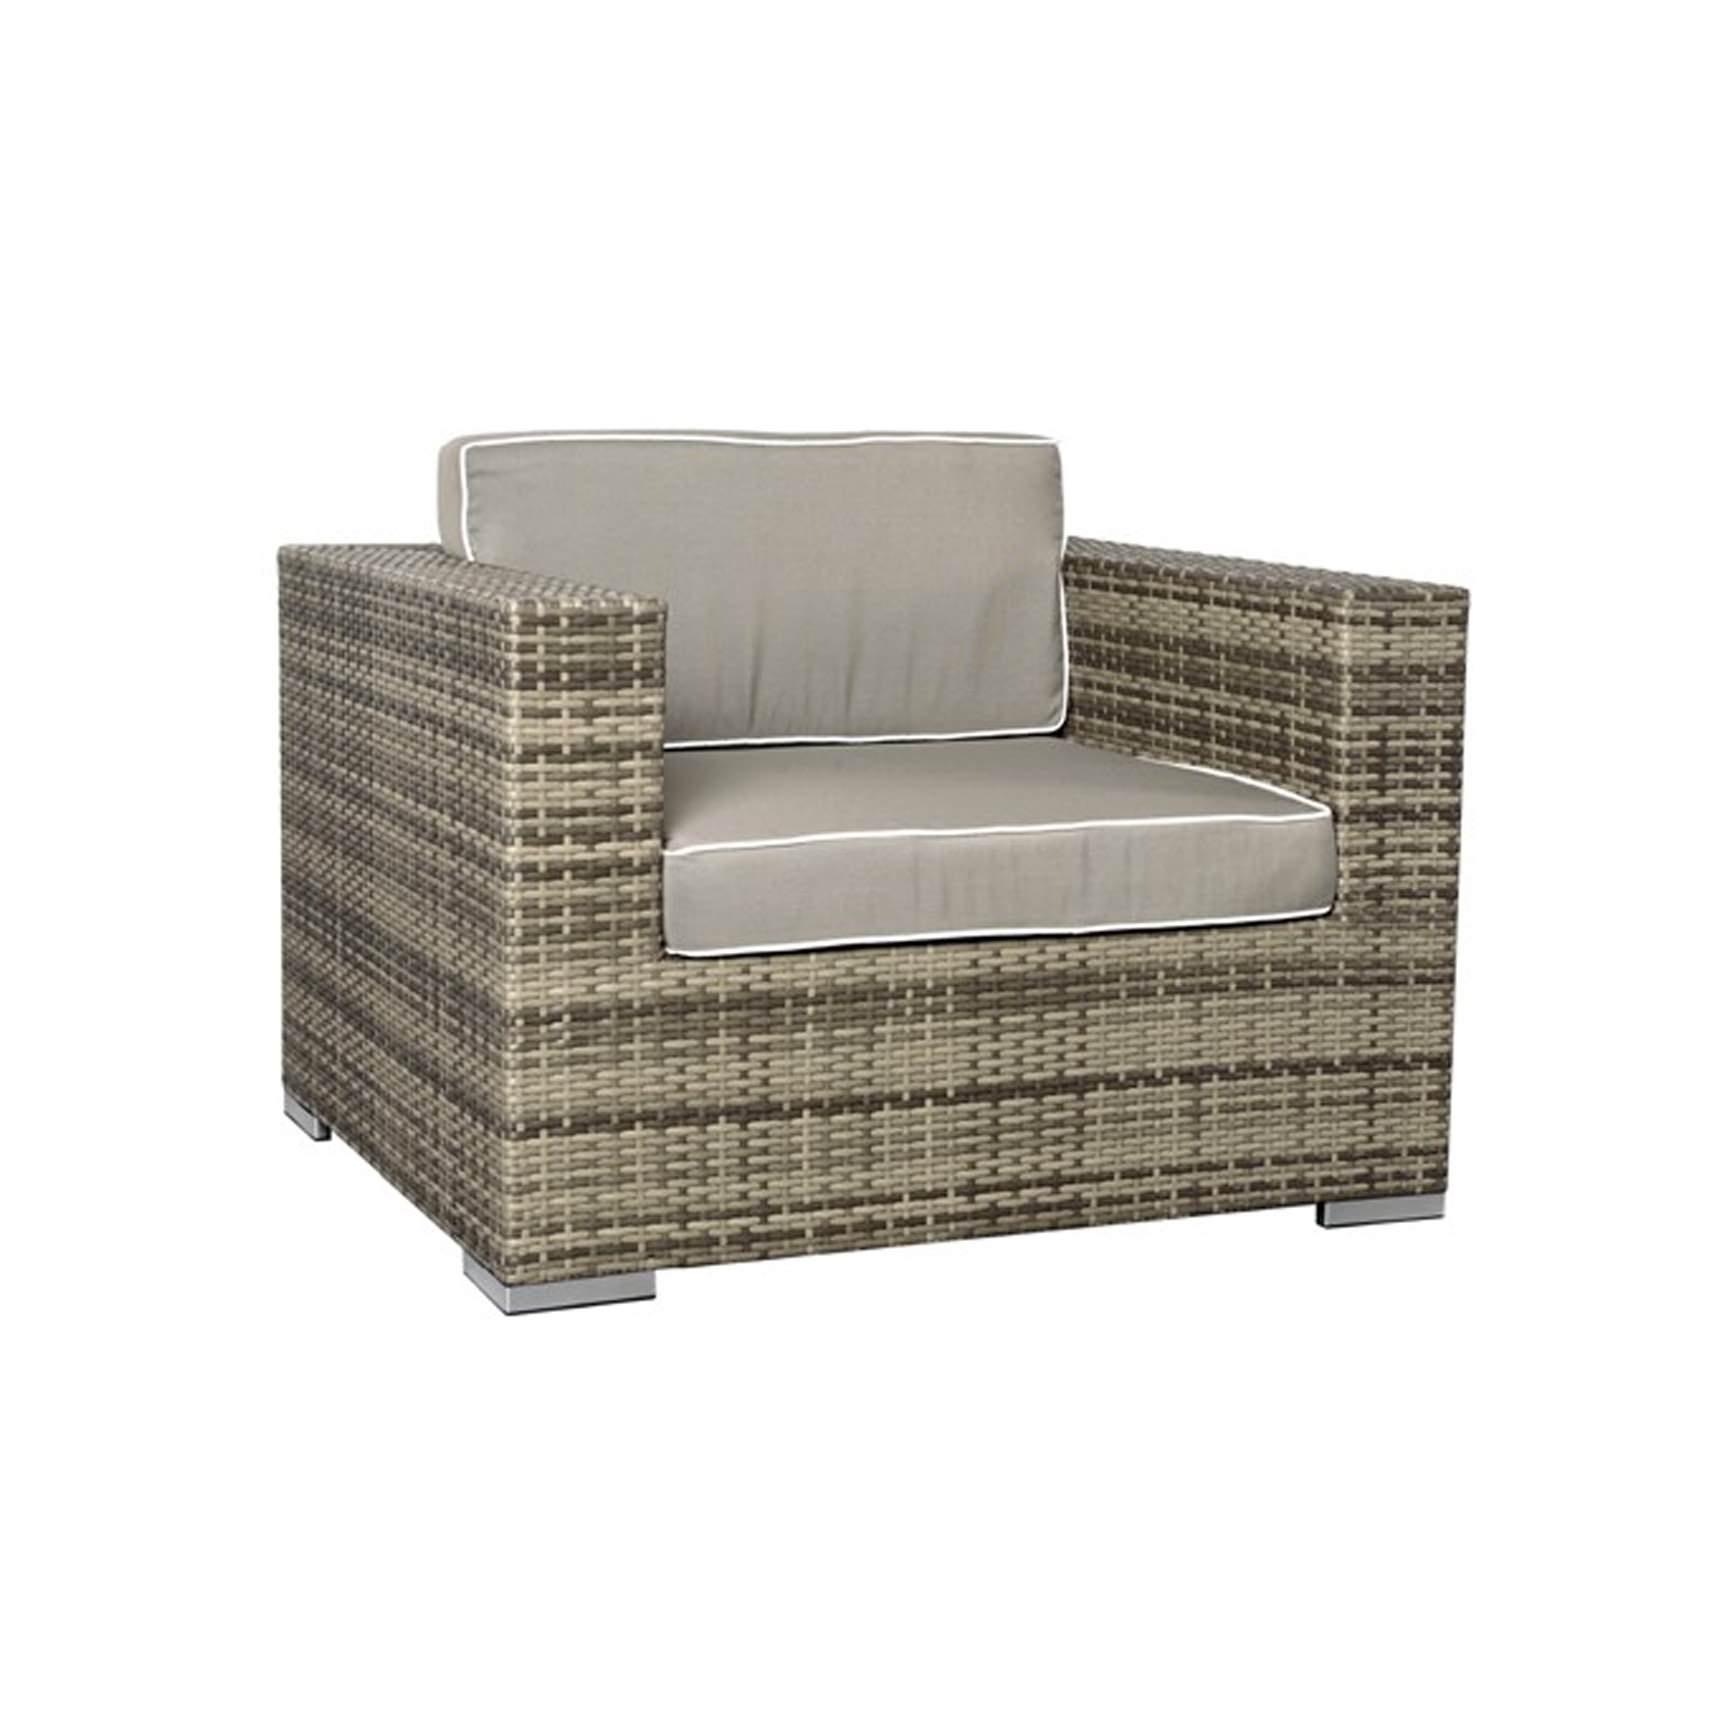 rattan lounge grau rund. Black Bedroom Furniture Sets. Home Design Ideas